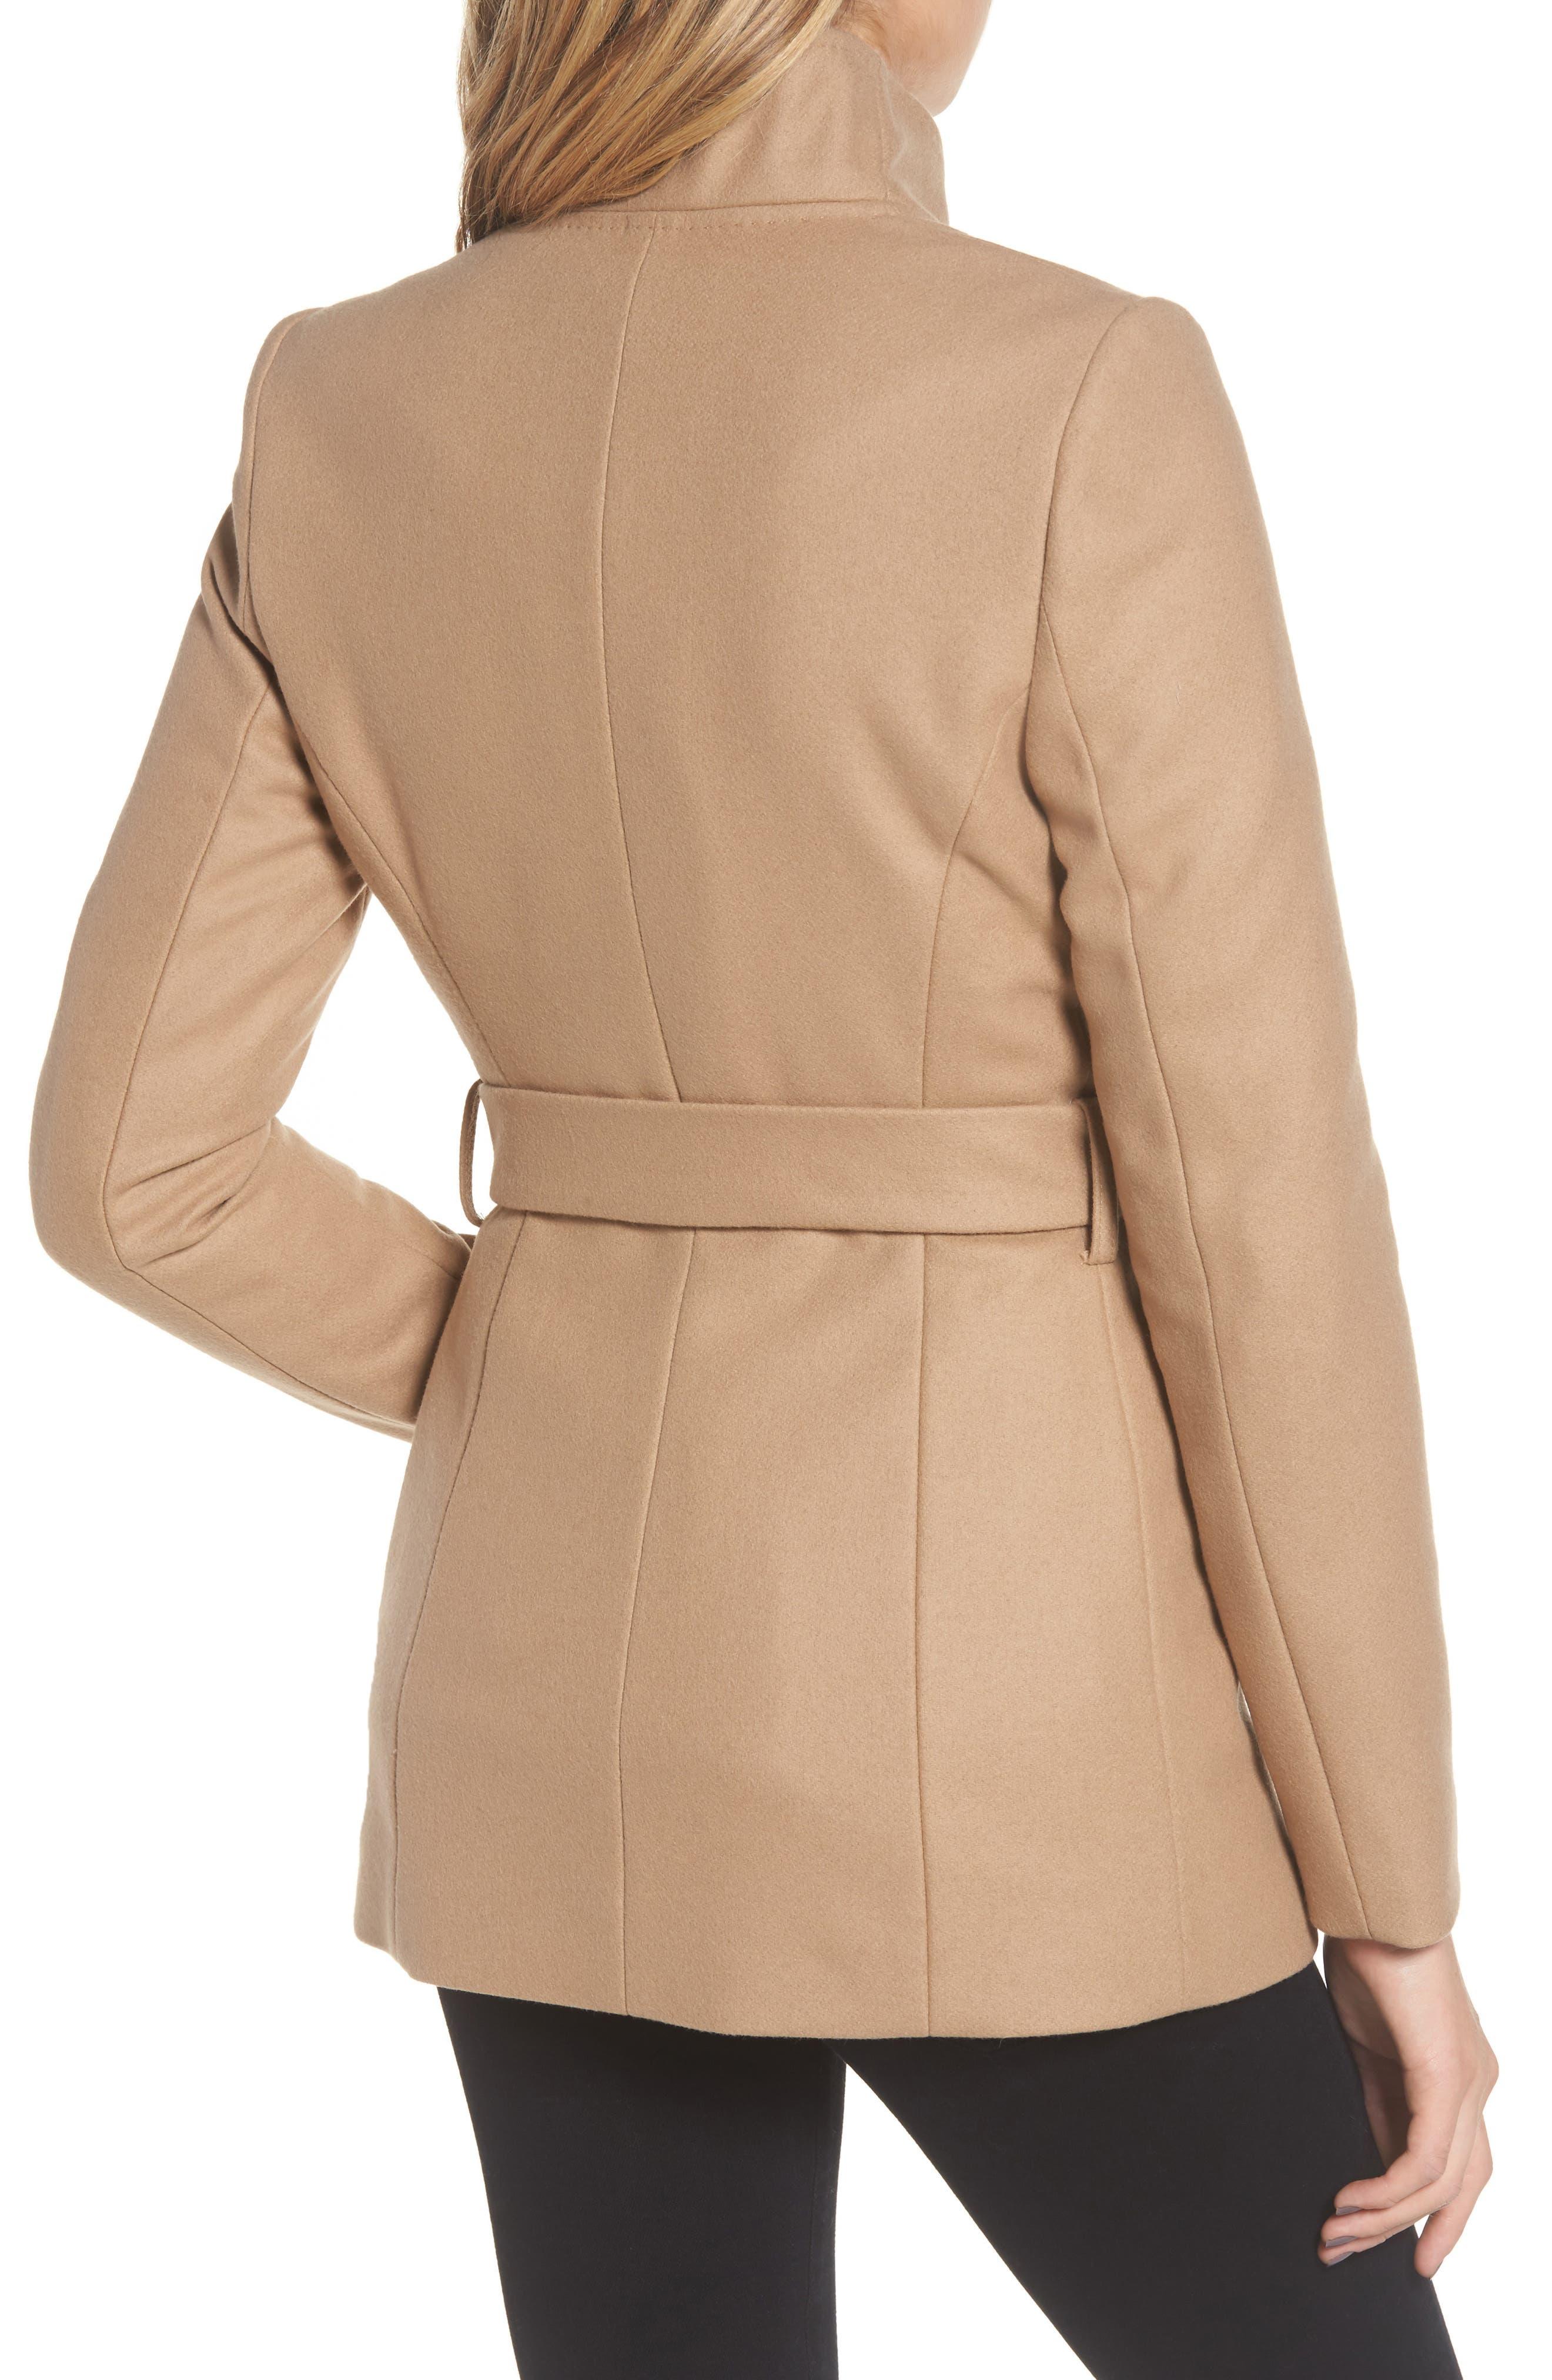 Wool Blend Short Wrap Coat,                             Alternate thumbnail 2, color,                             271